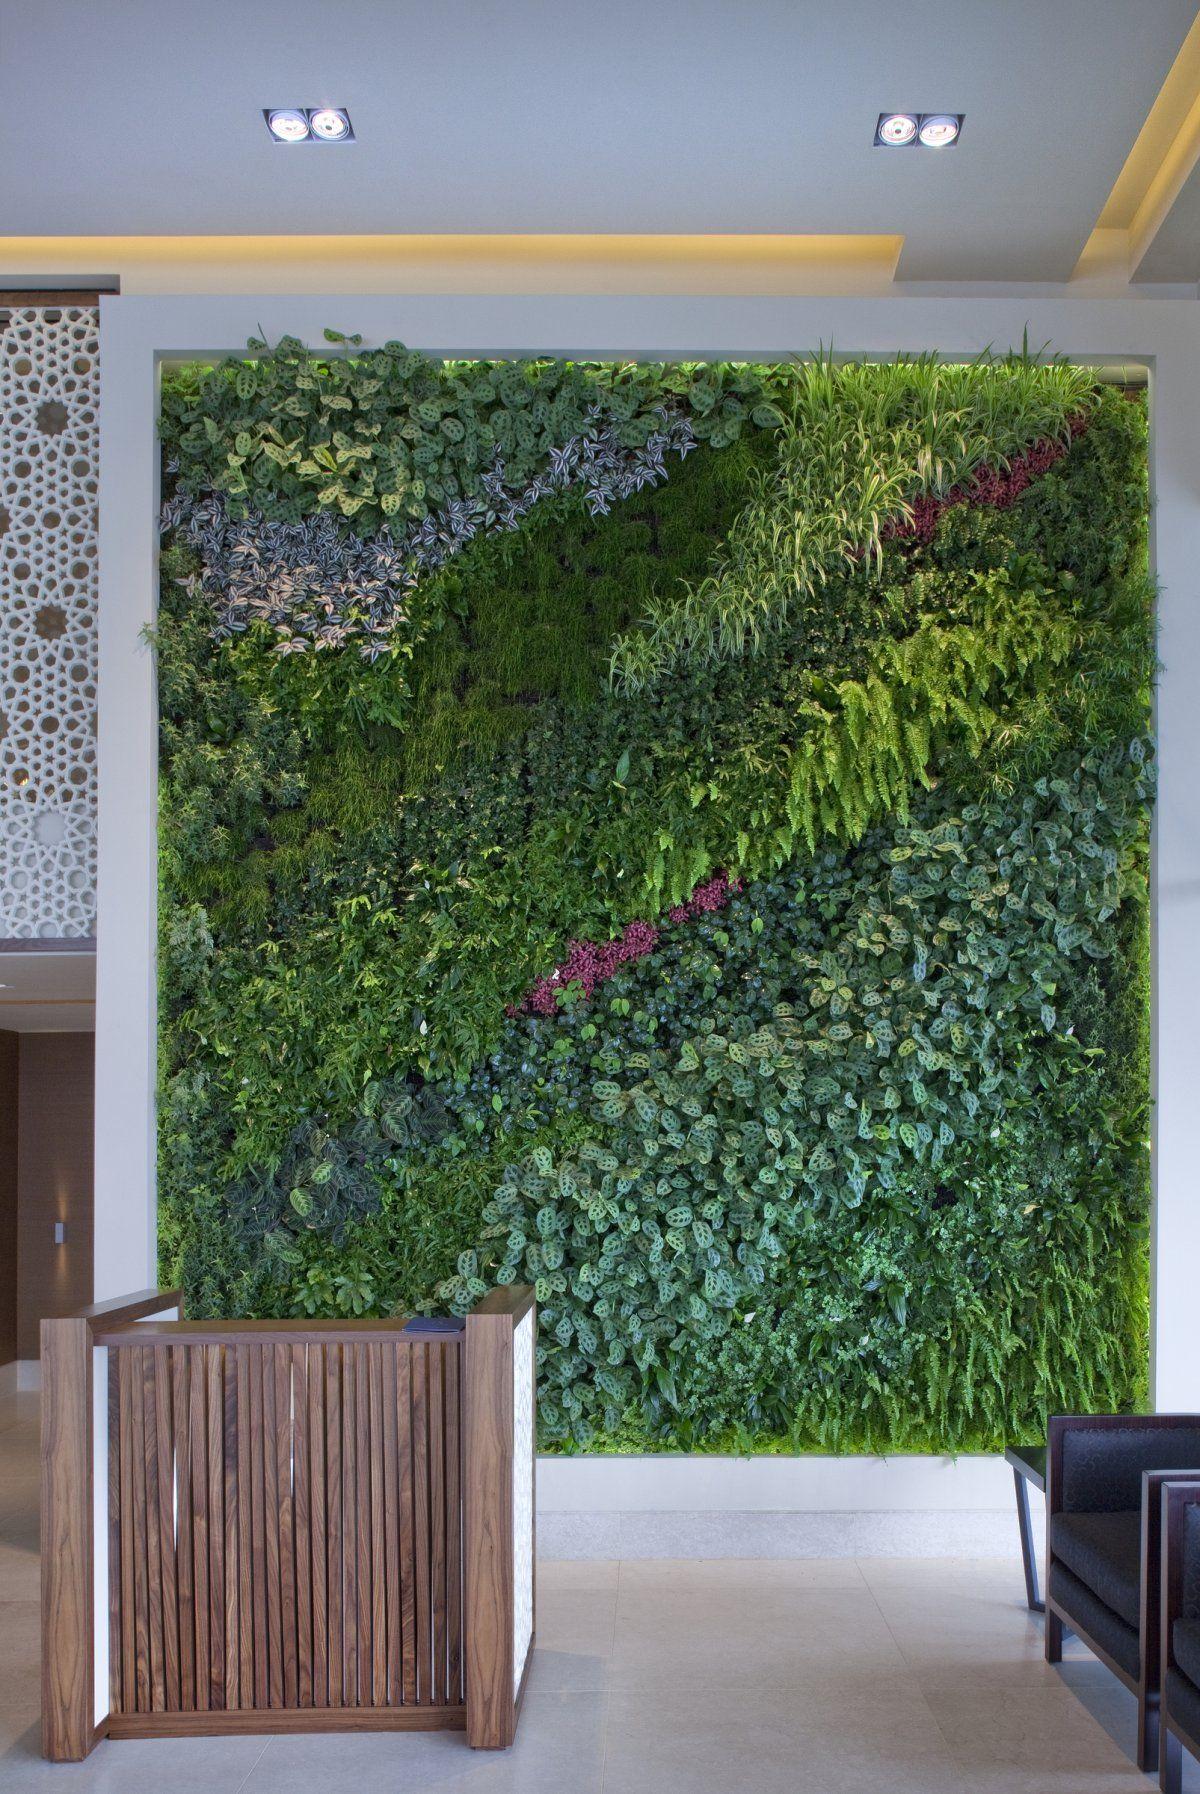 Green Wall Vertical Garden Indoor Vertical Garden Garden Wall